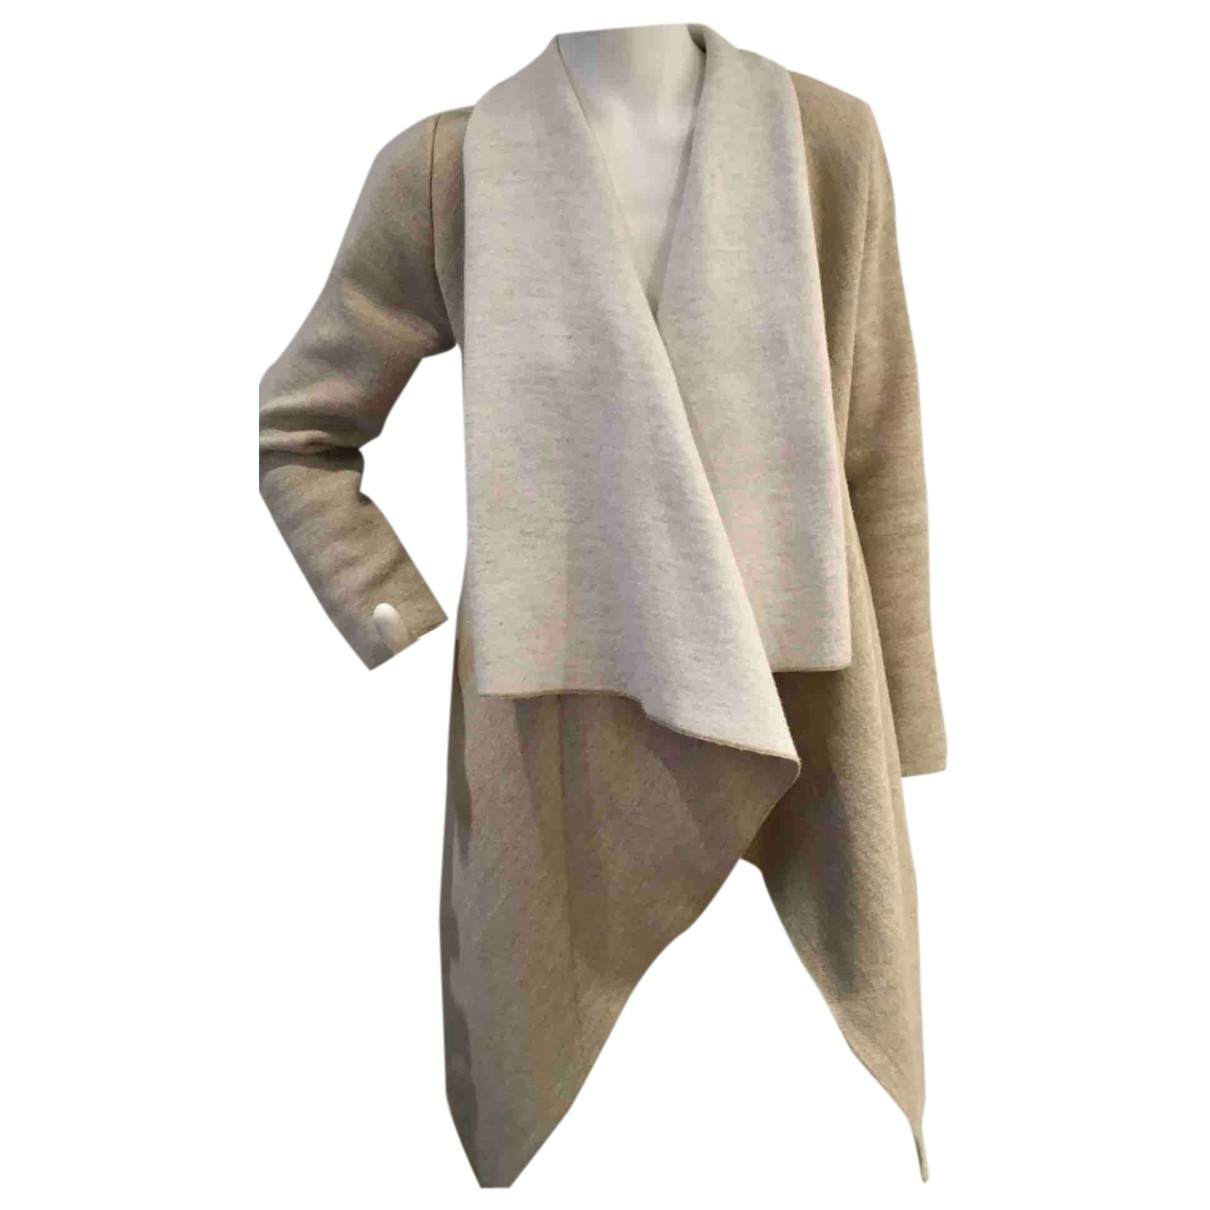 Zara - Pull   pour femme en laine - beige